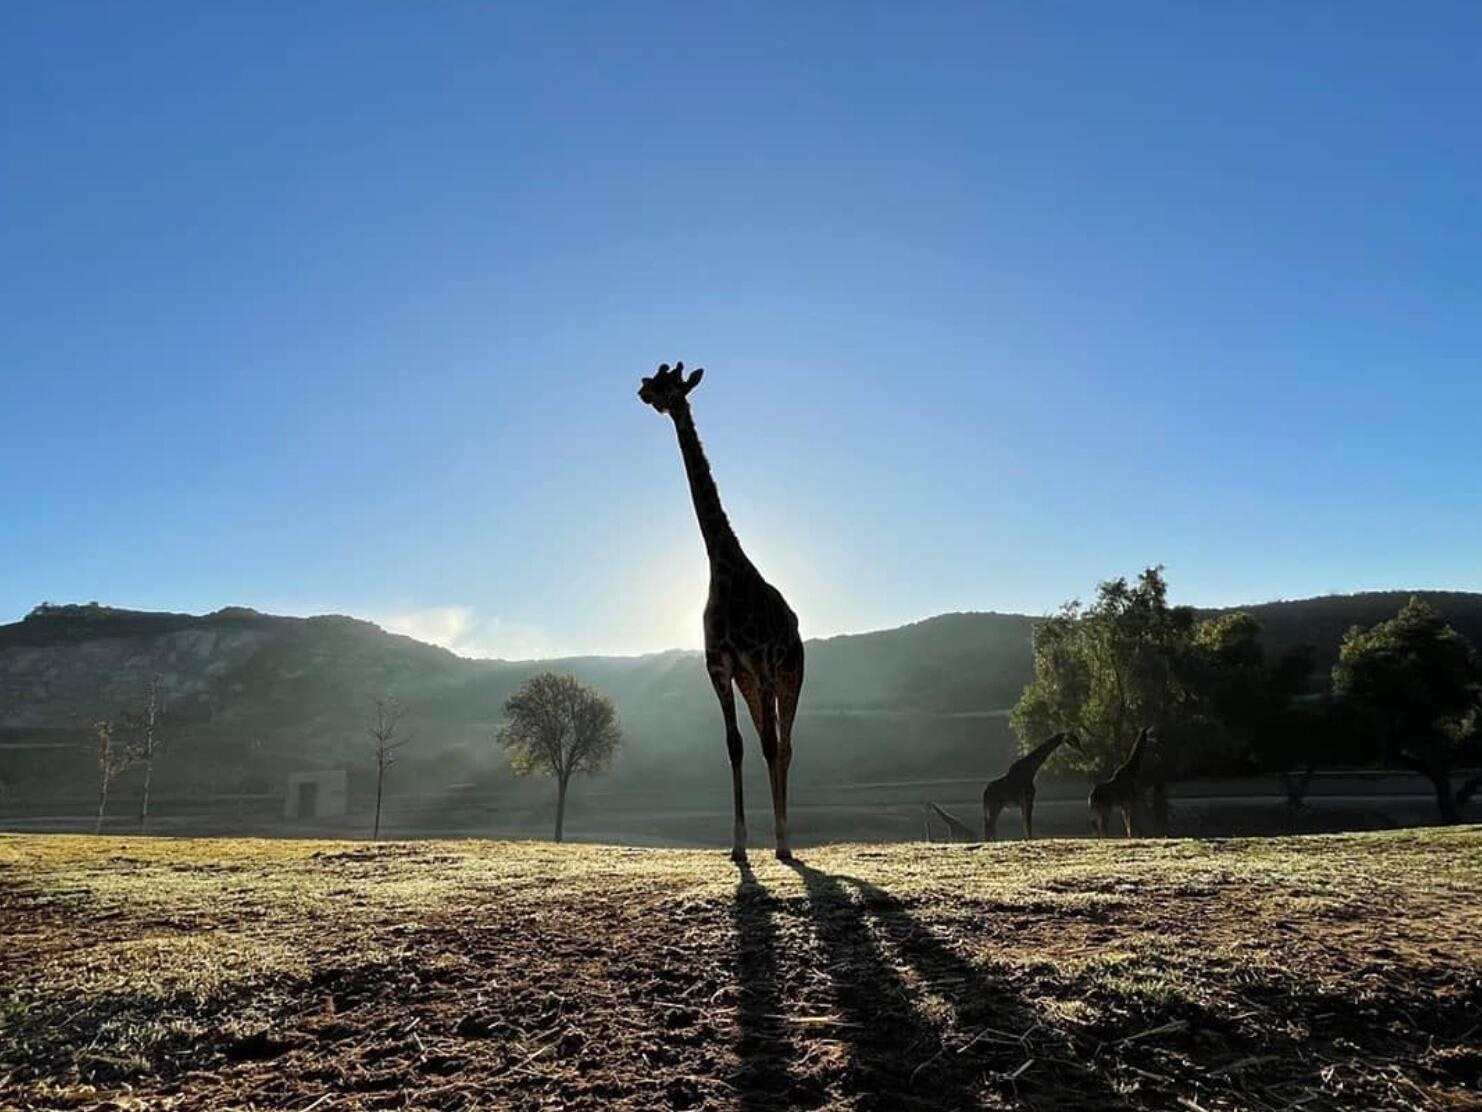 San Diego Attractions | San Diego Zoo & Safari Park Now Open